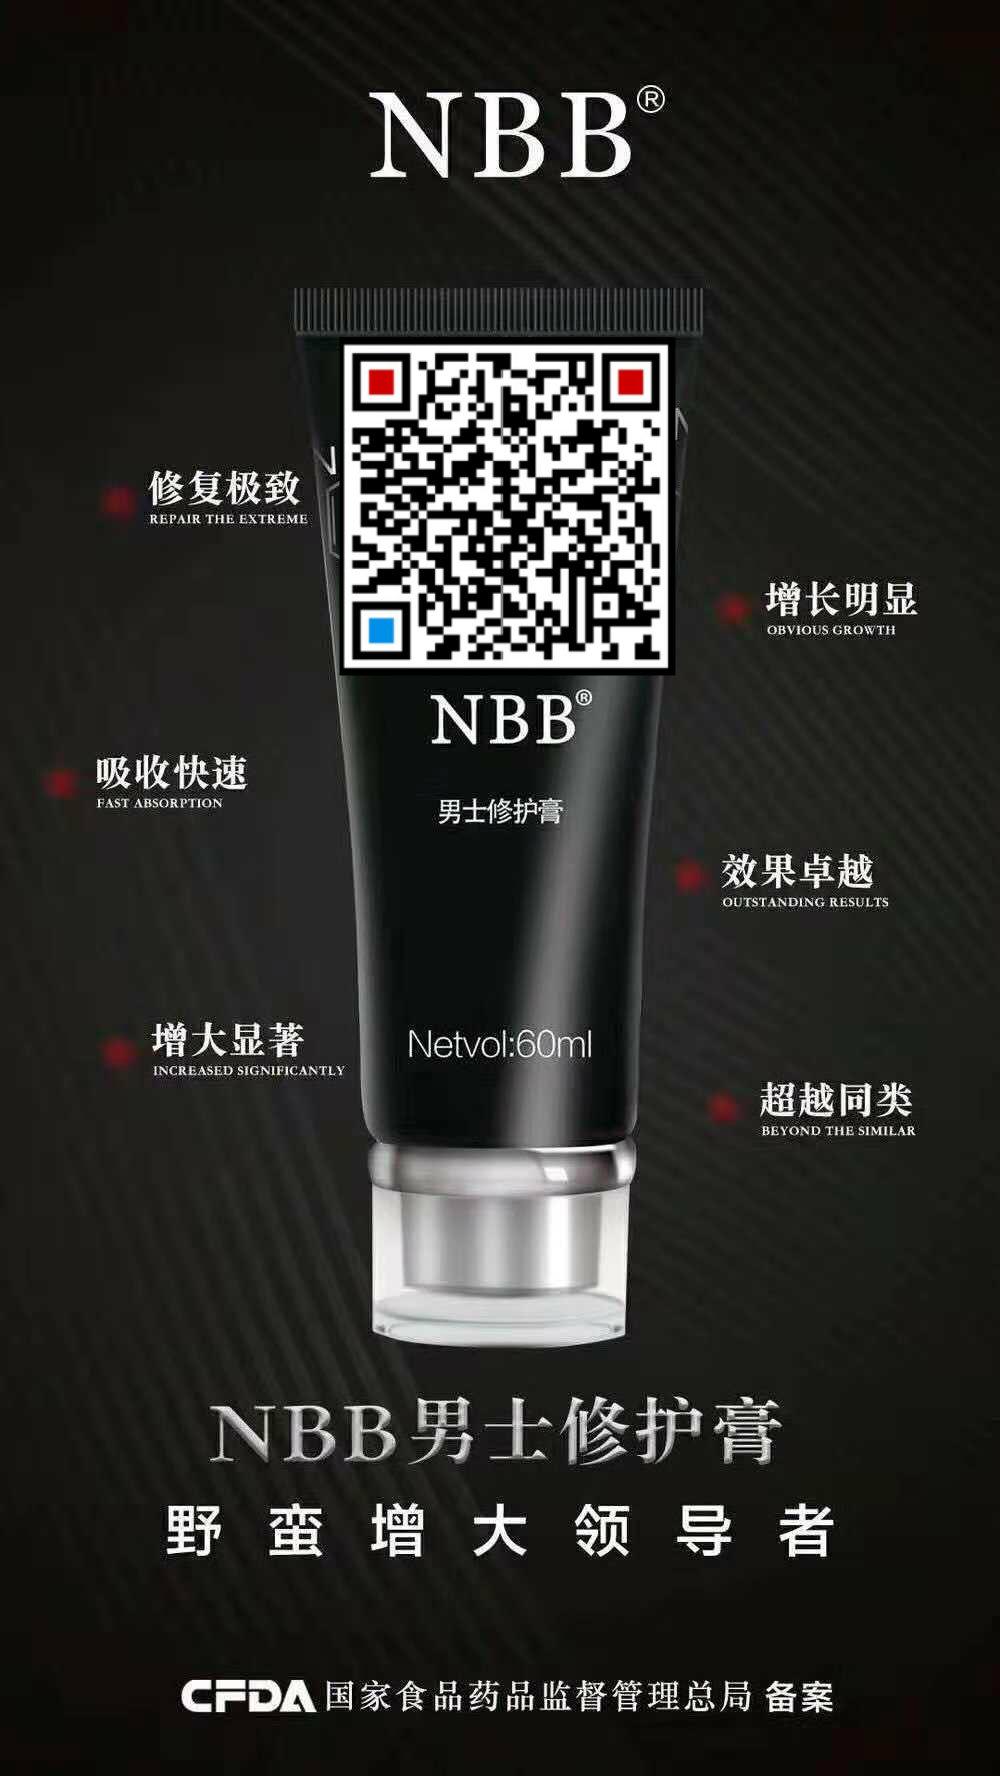 NBB增大膏真的能变大变粗吗?